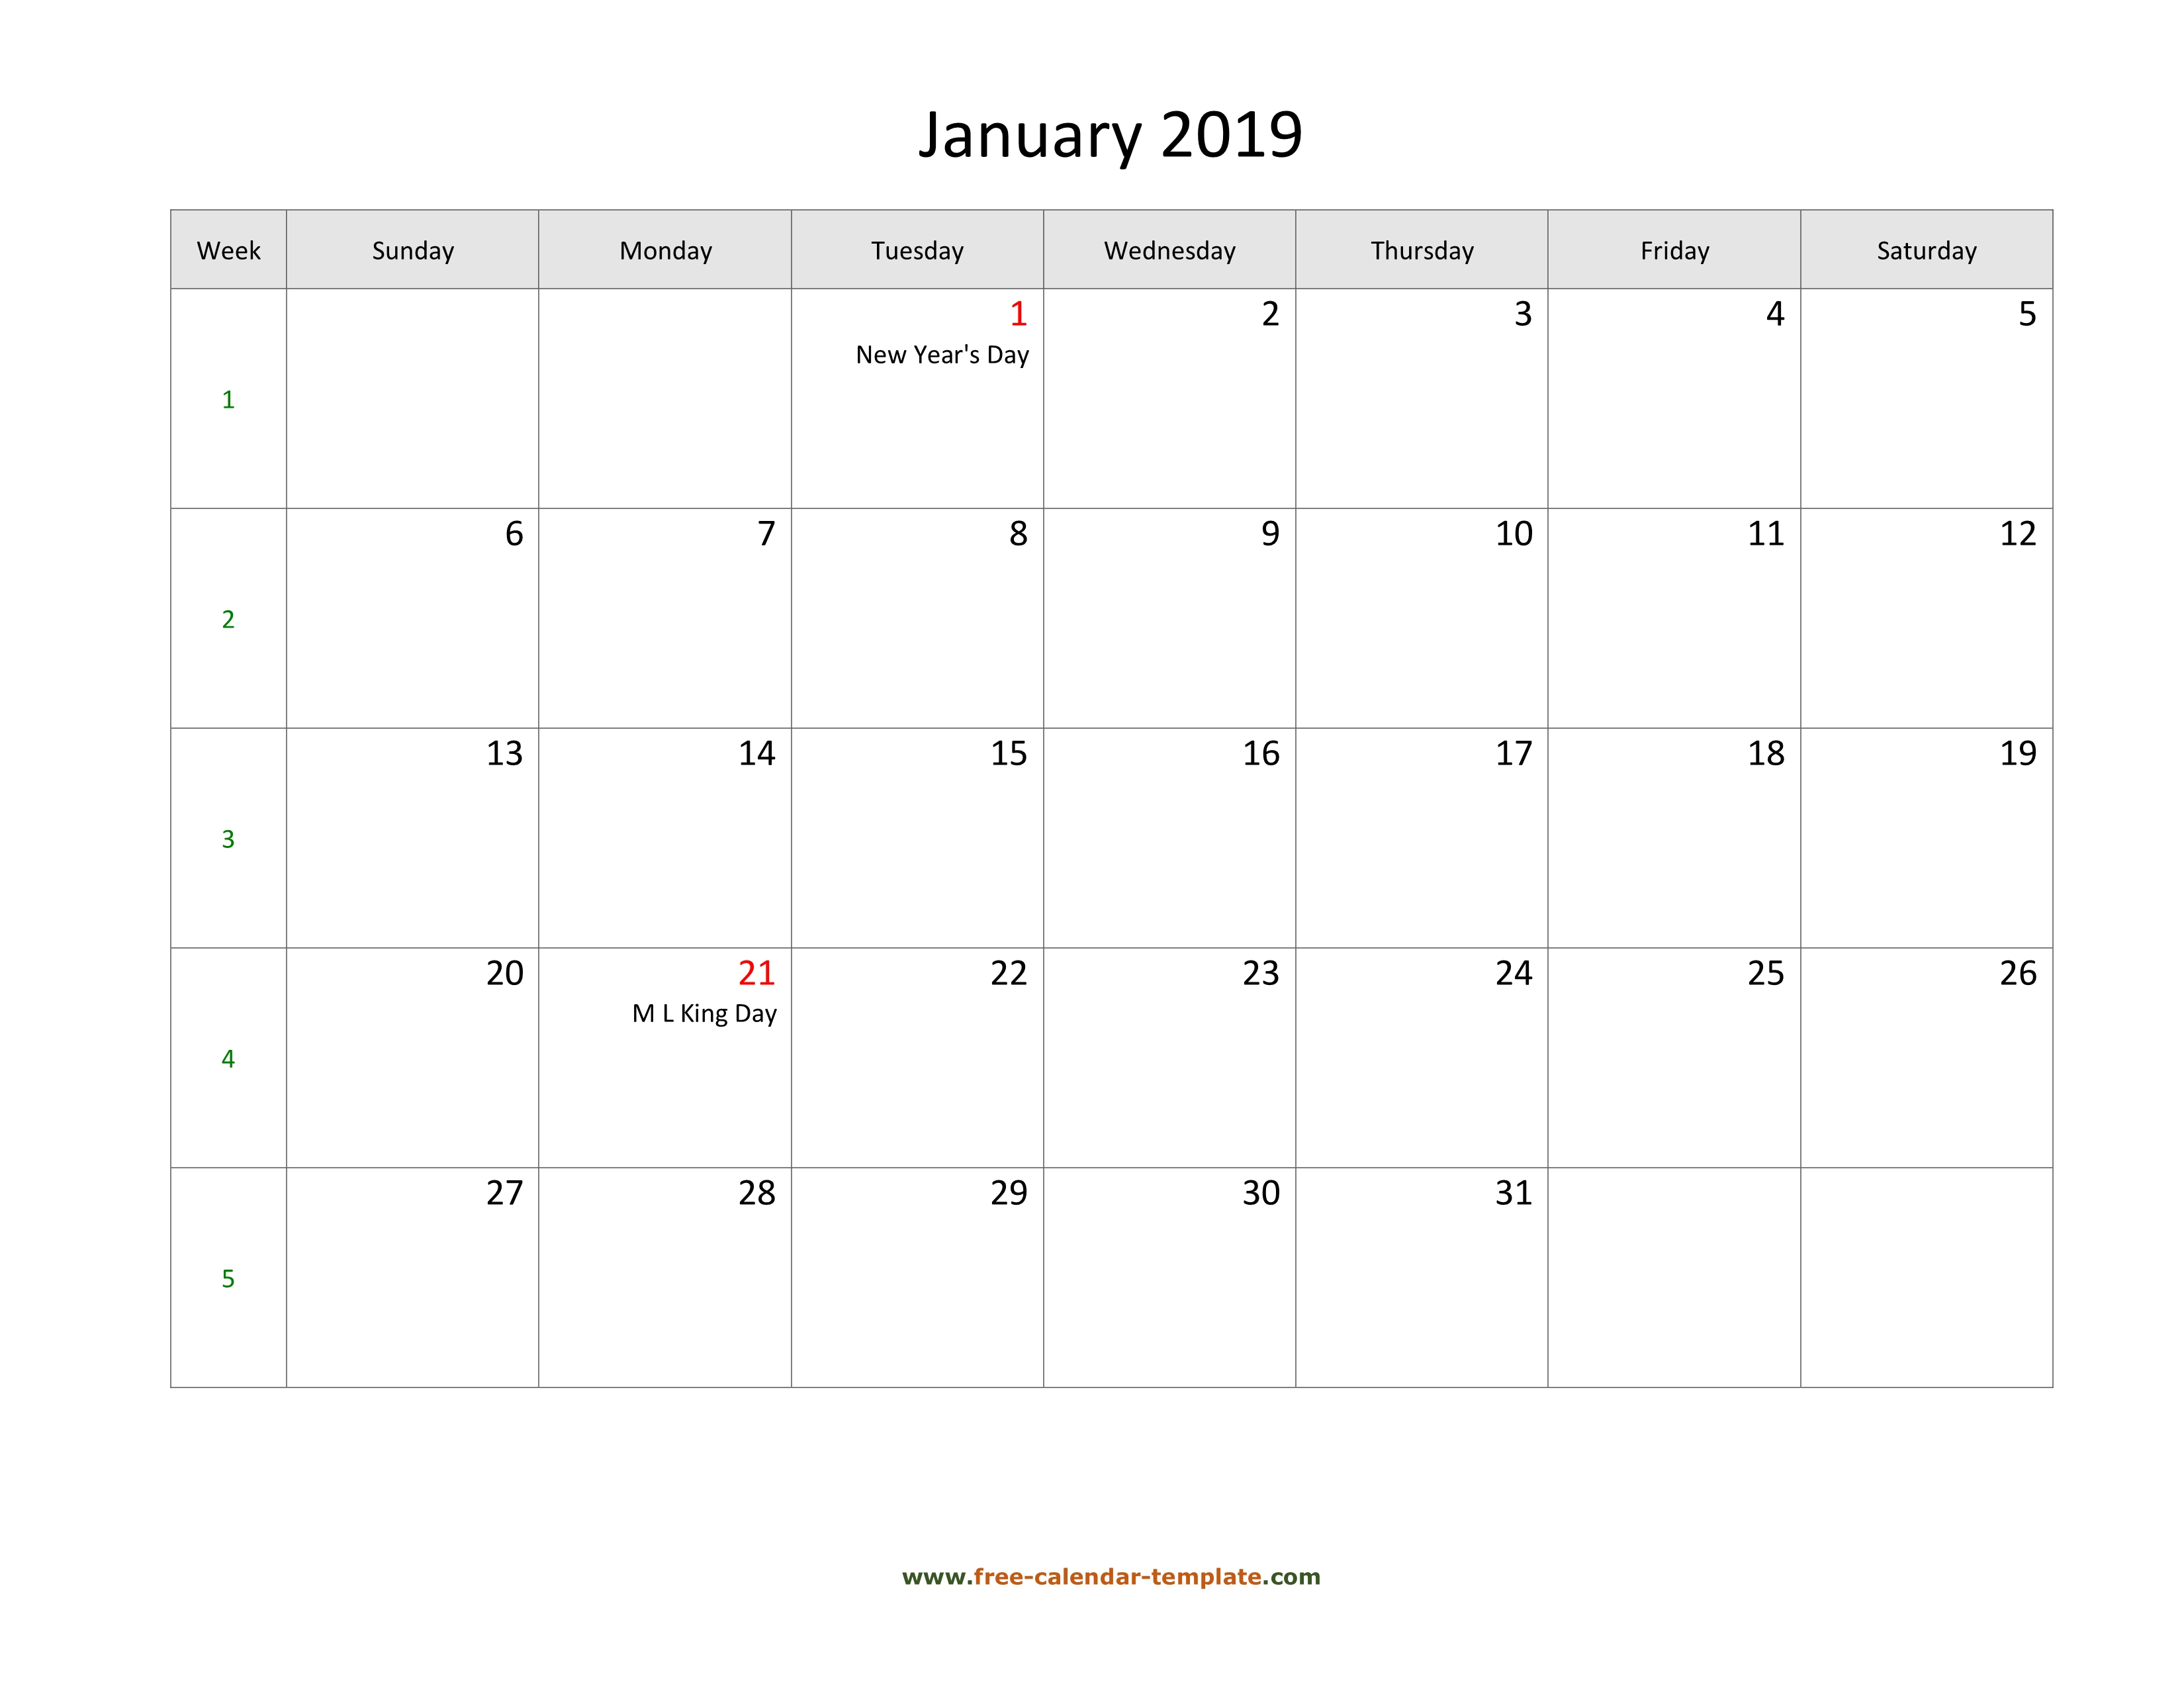 Free 2019 Calendar Blank January Template (Horizontal) | Free throughout January Calendar Printable Template With Holidays